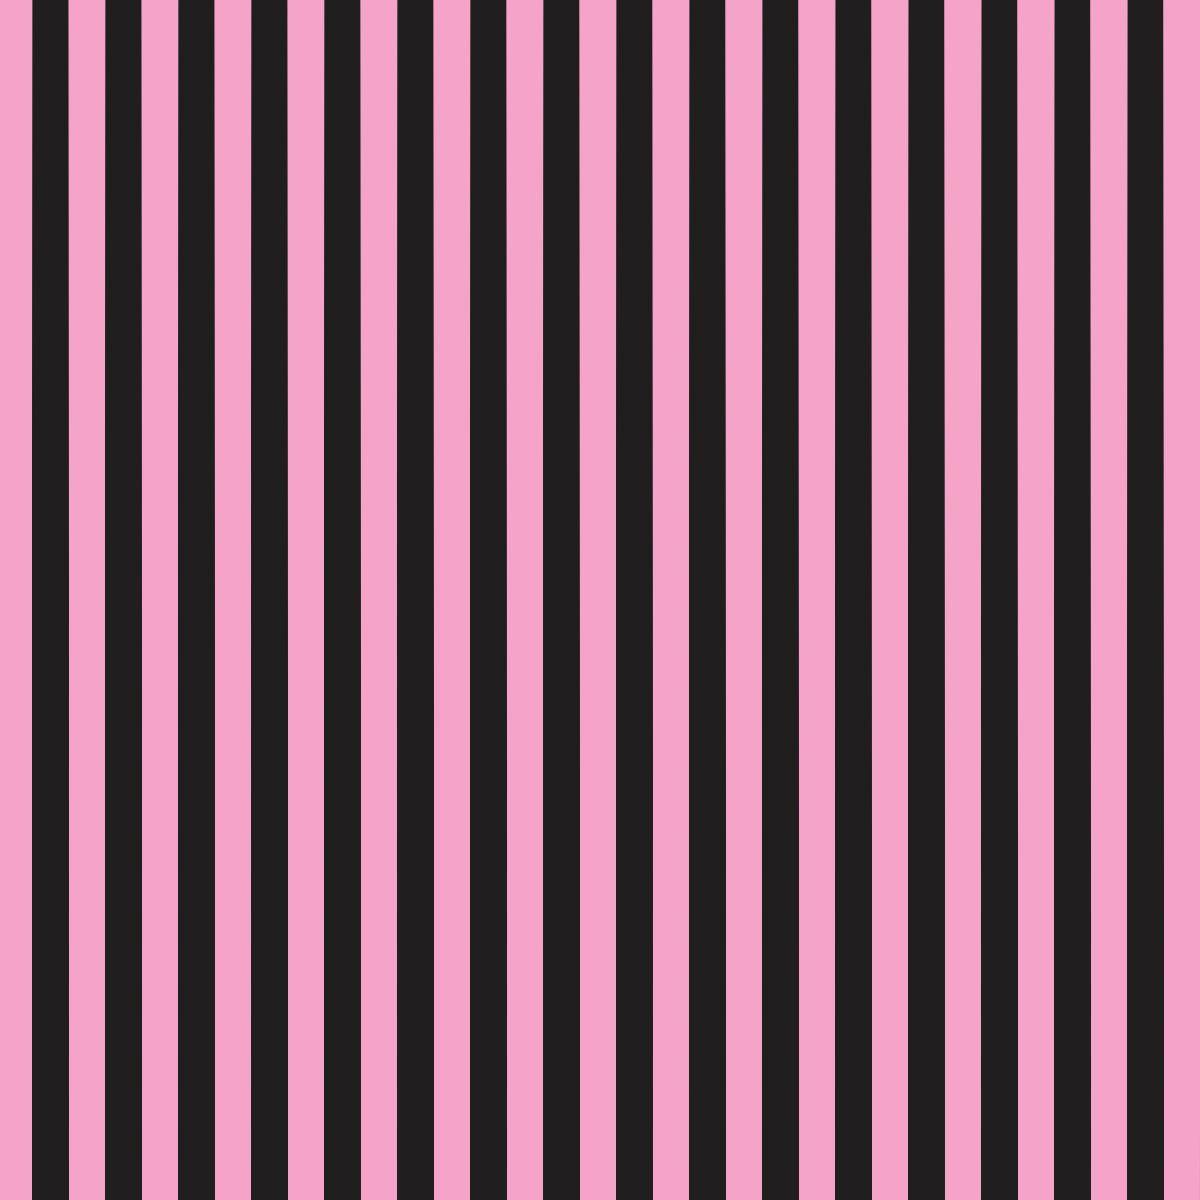 Wallpaper Black Pink: Scrapbooking Paper Pink And Black